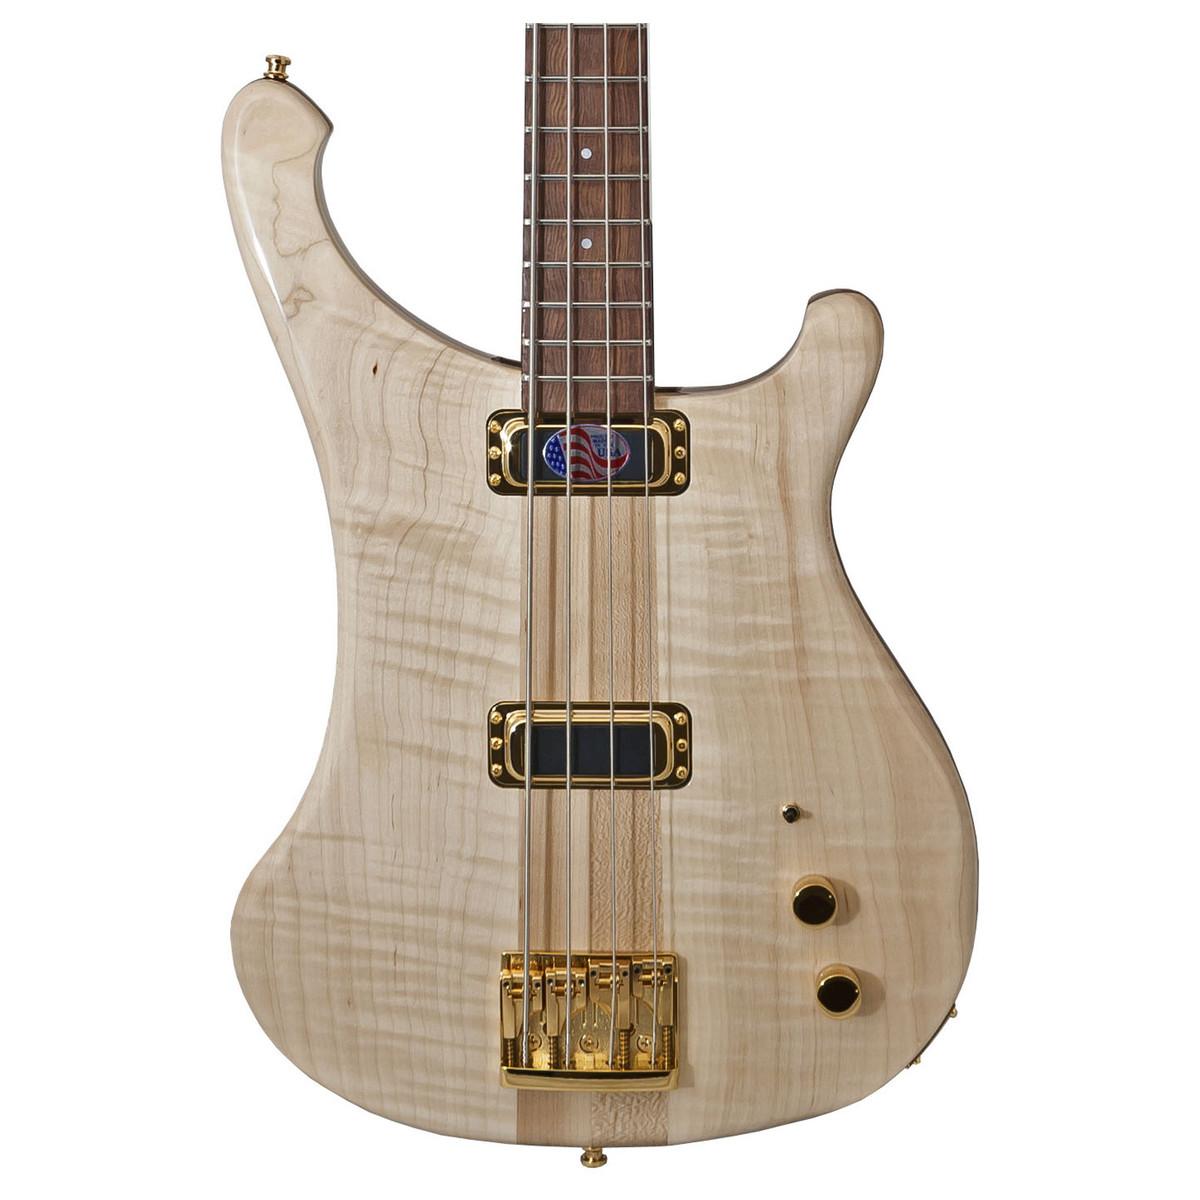 rickenbacker 4004cii cheyenne ii bass guitar mapleglo at. Black Bedroom Furniture Sets. Home Design Ideas